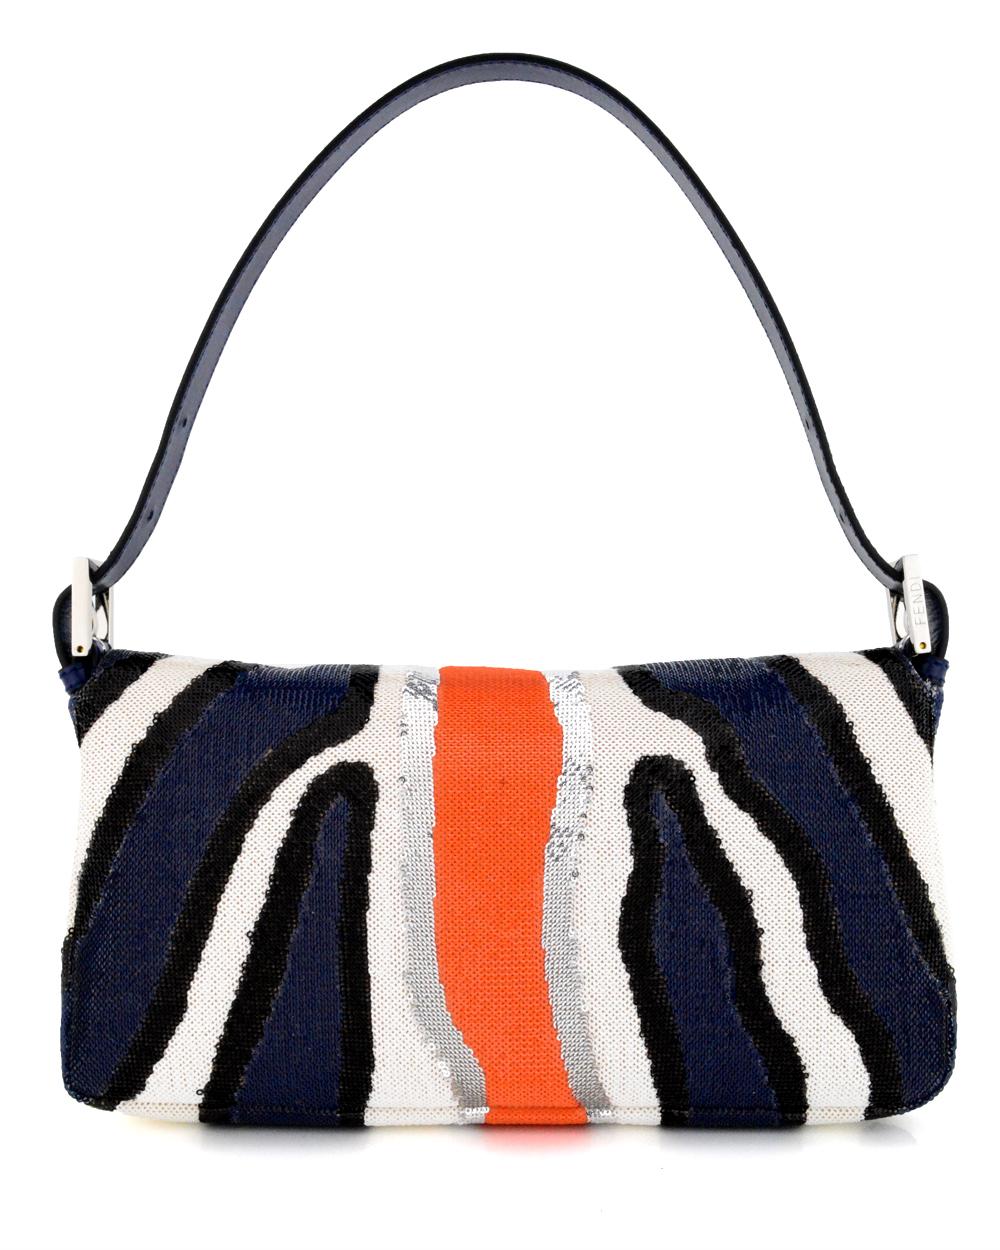 Fendi Zebra Bag